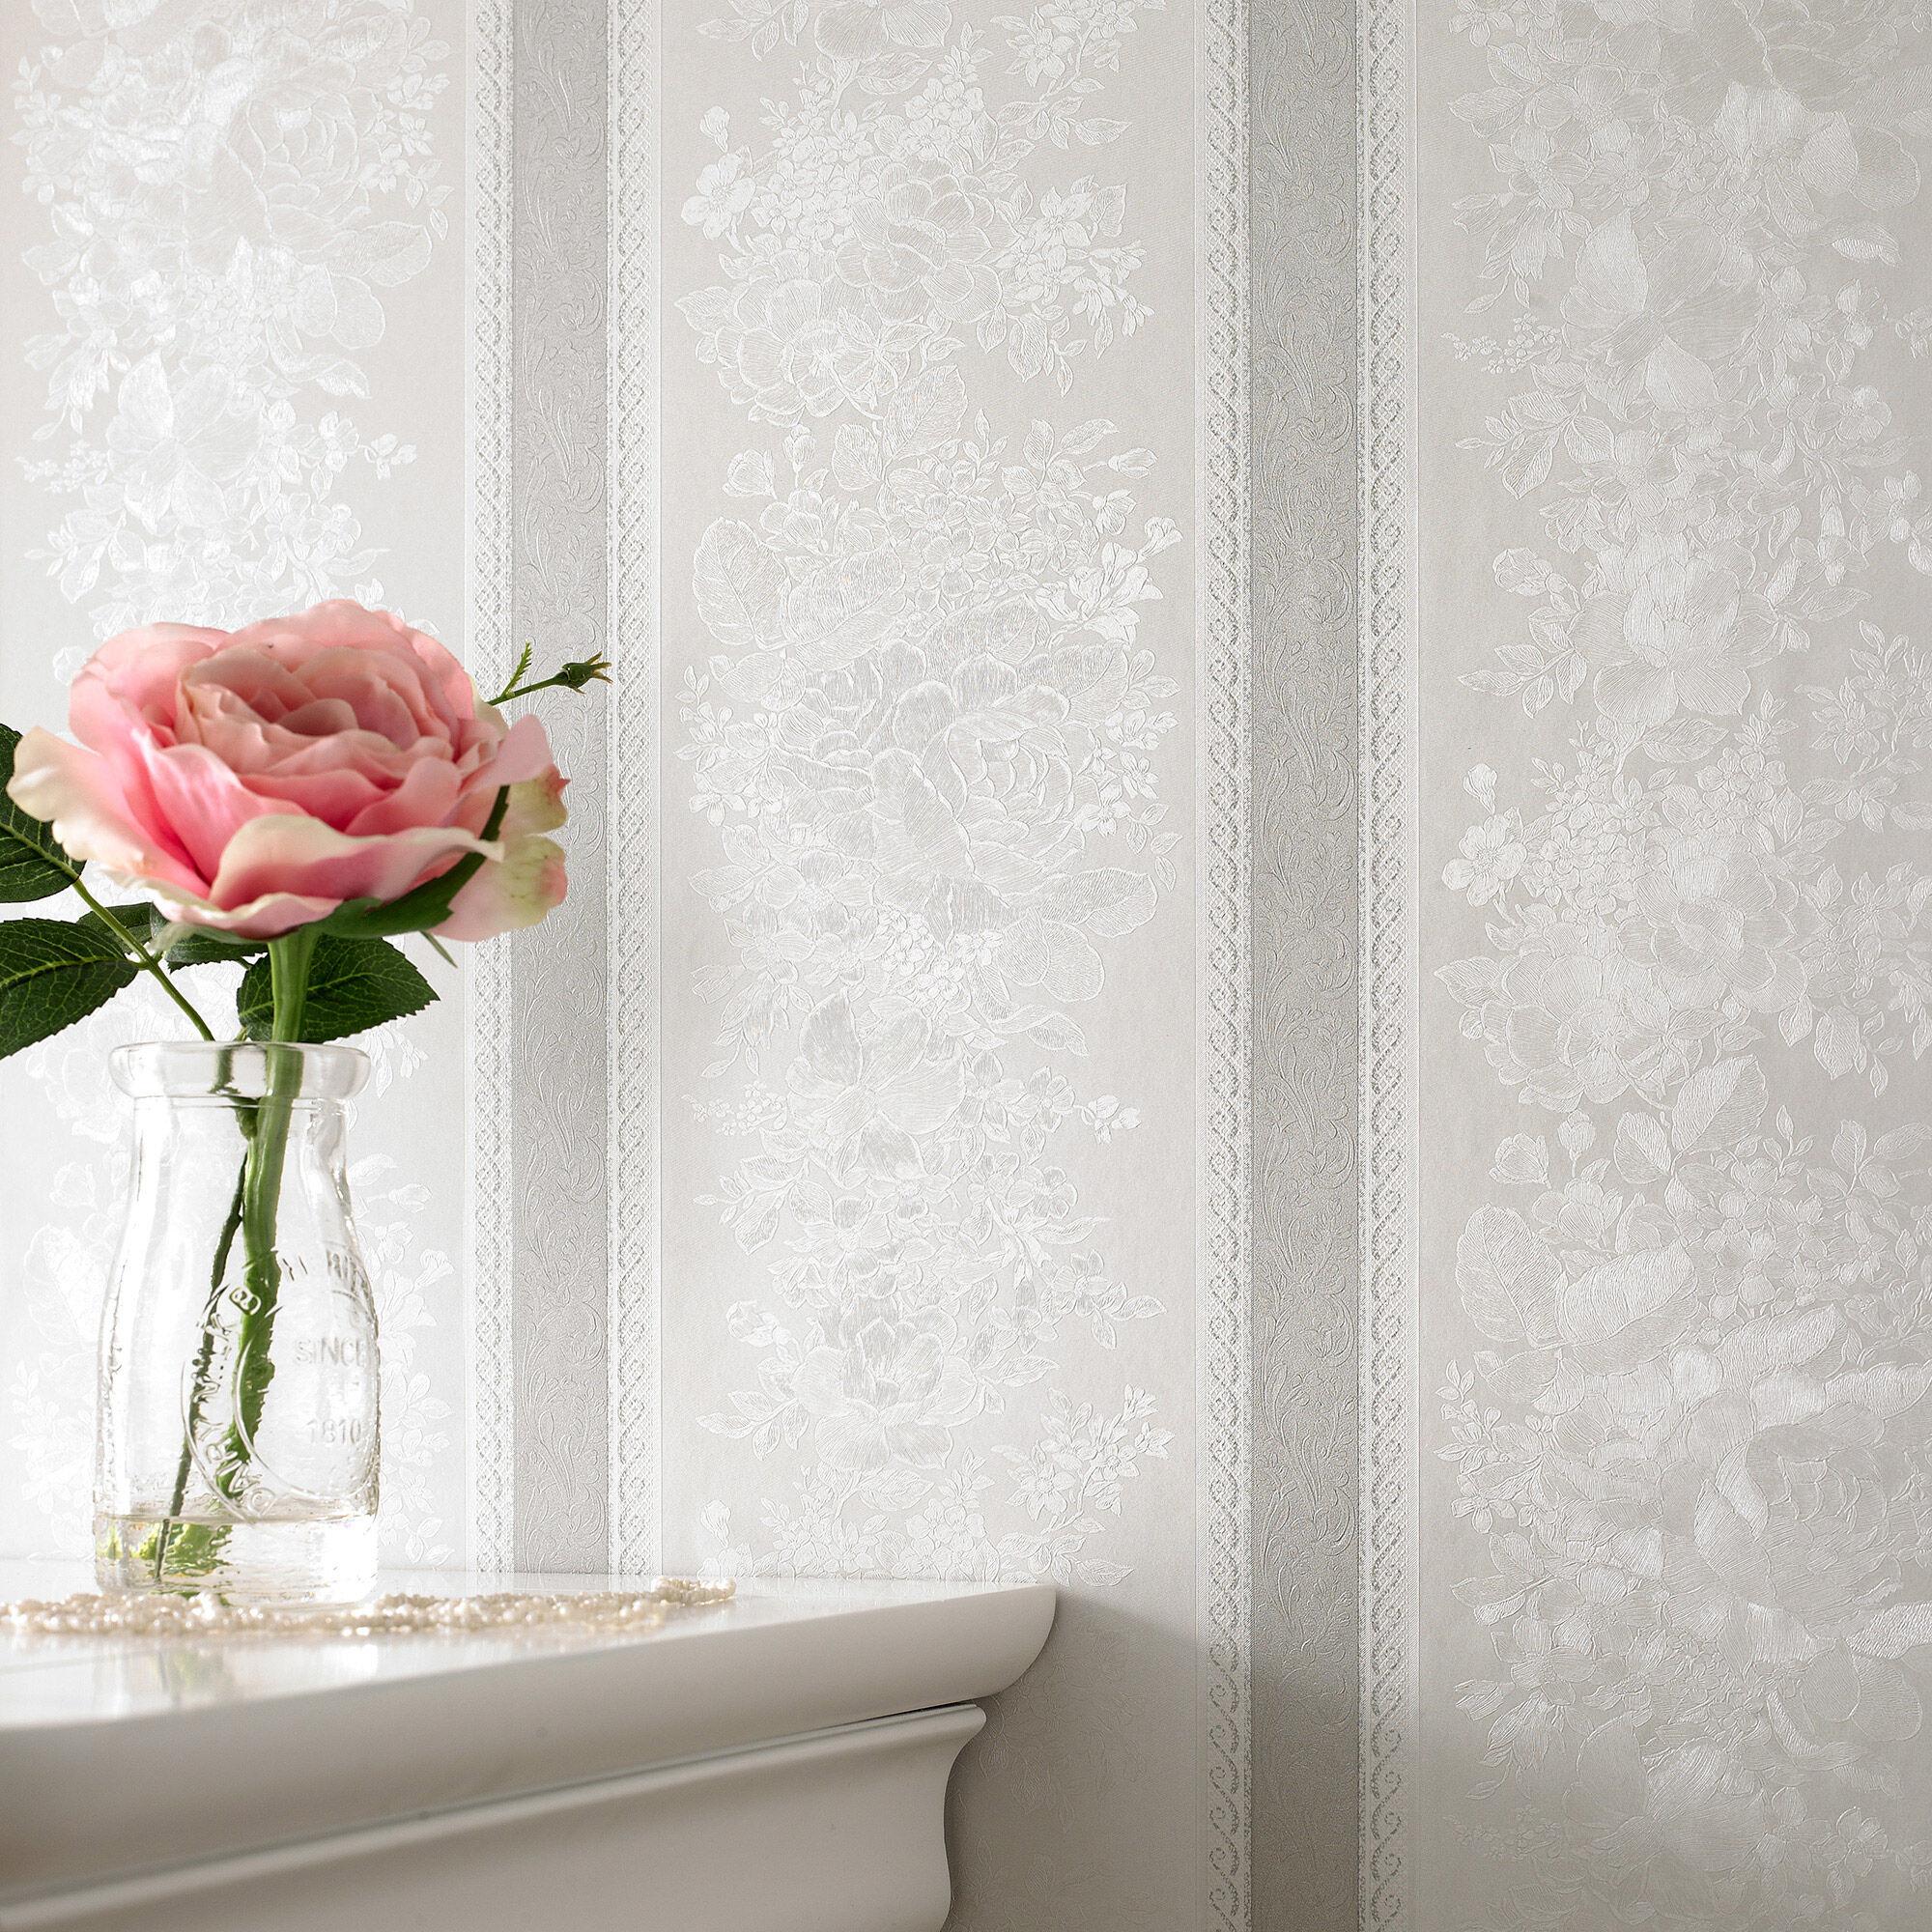 Floral Stripe Silver Mist Wallpaper, ...